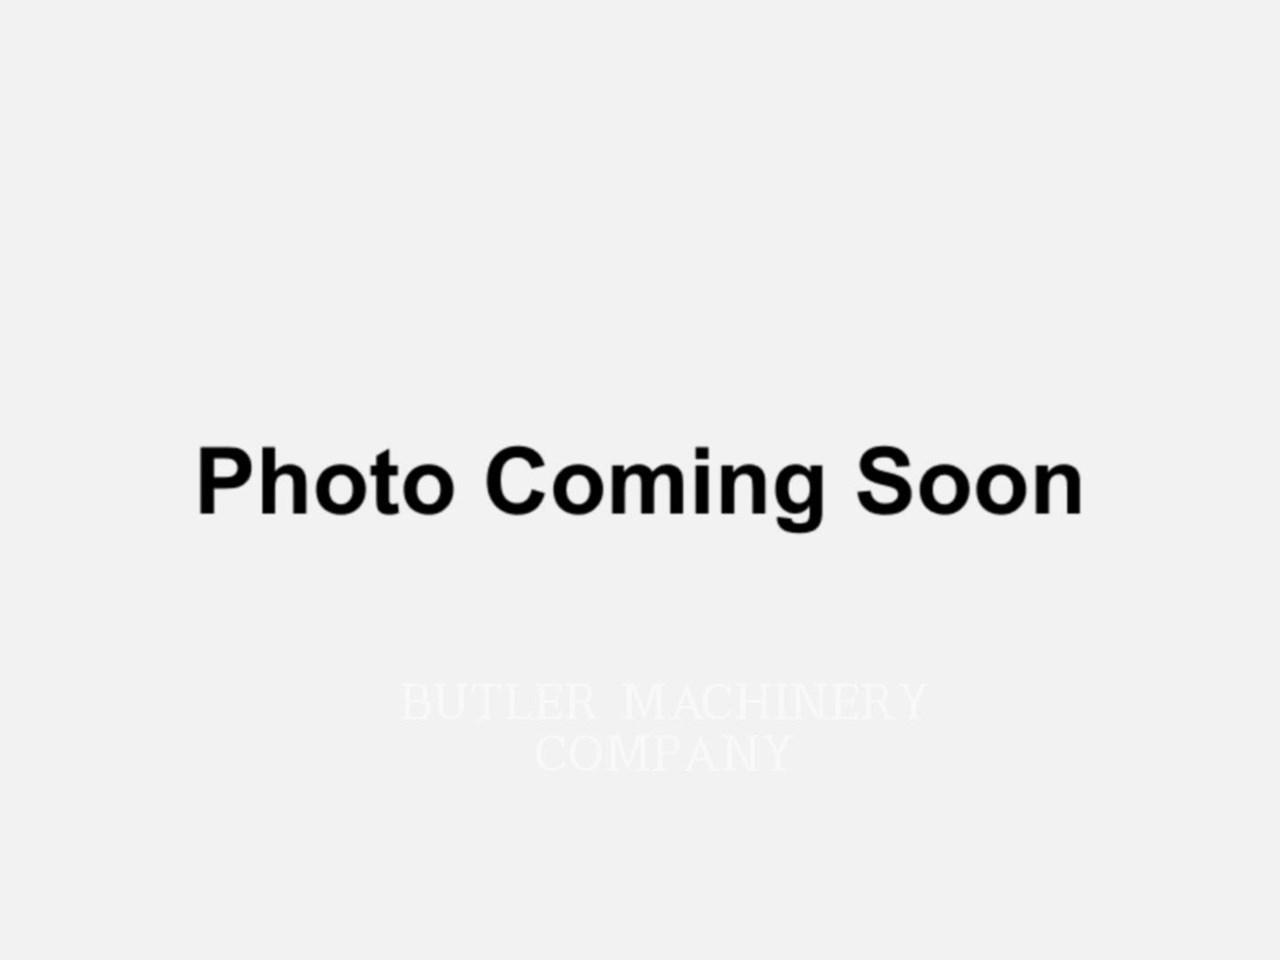 2019 Caterpillar 966 M Image 7